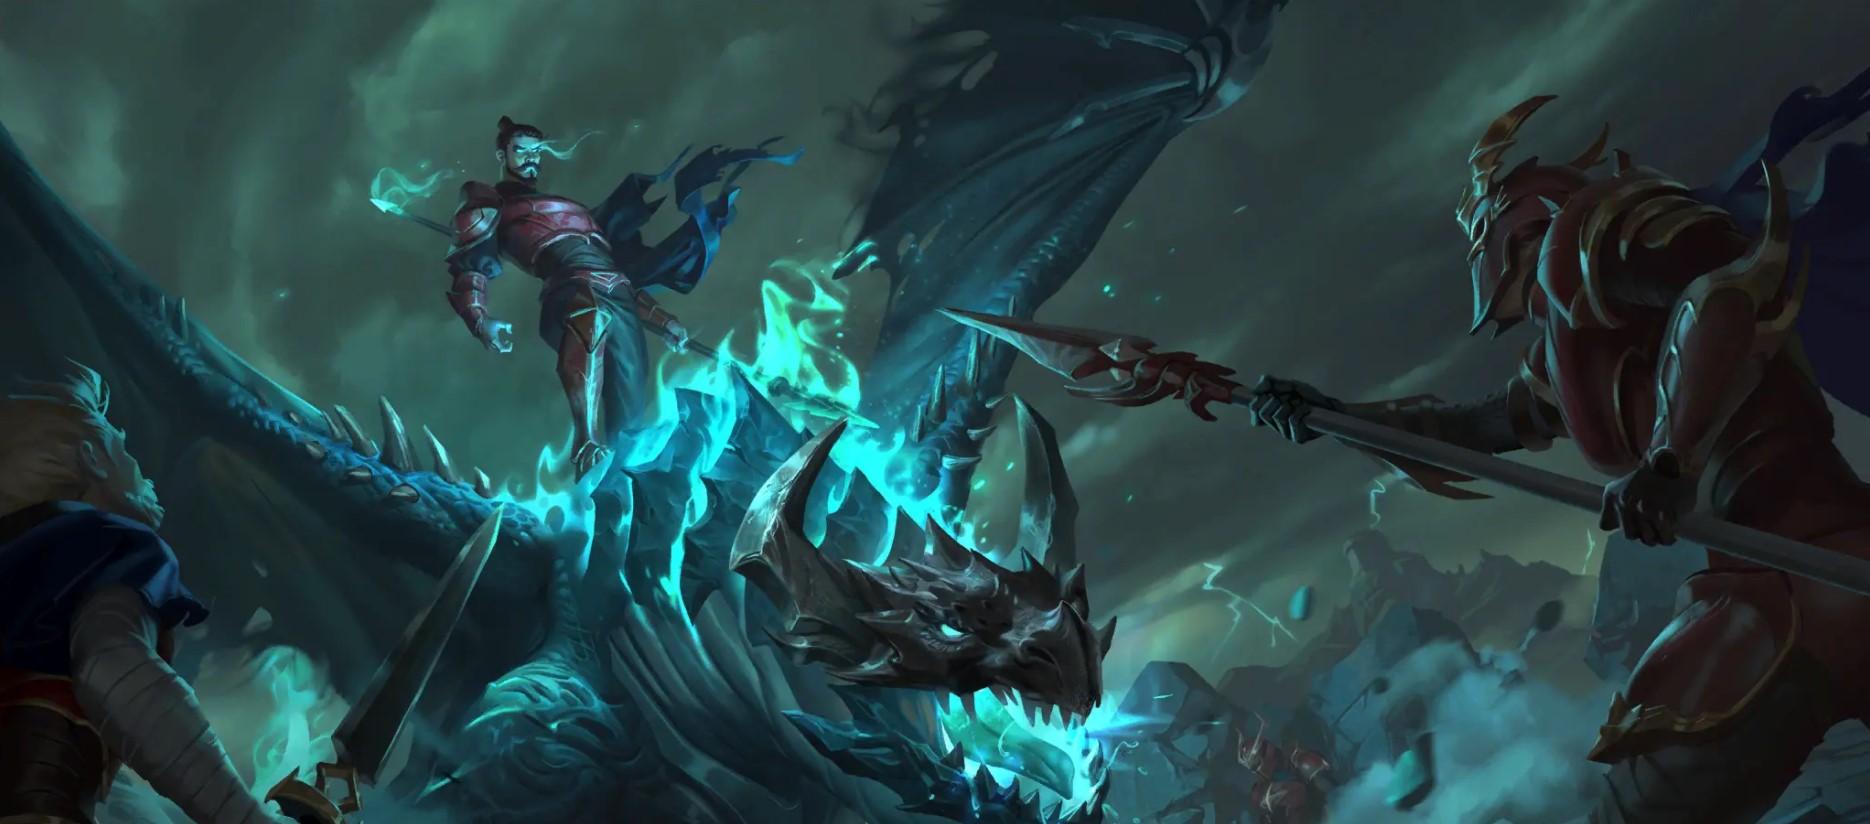 Ruined Dragonguard (LoR splash)